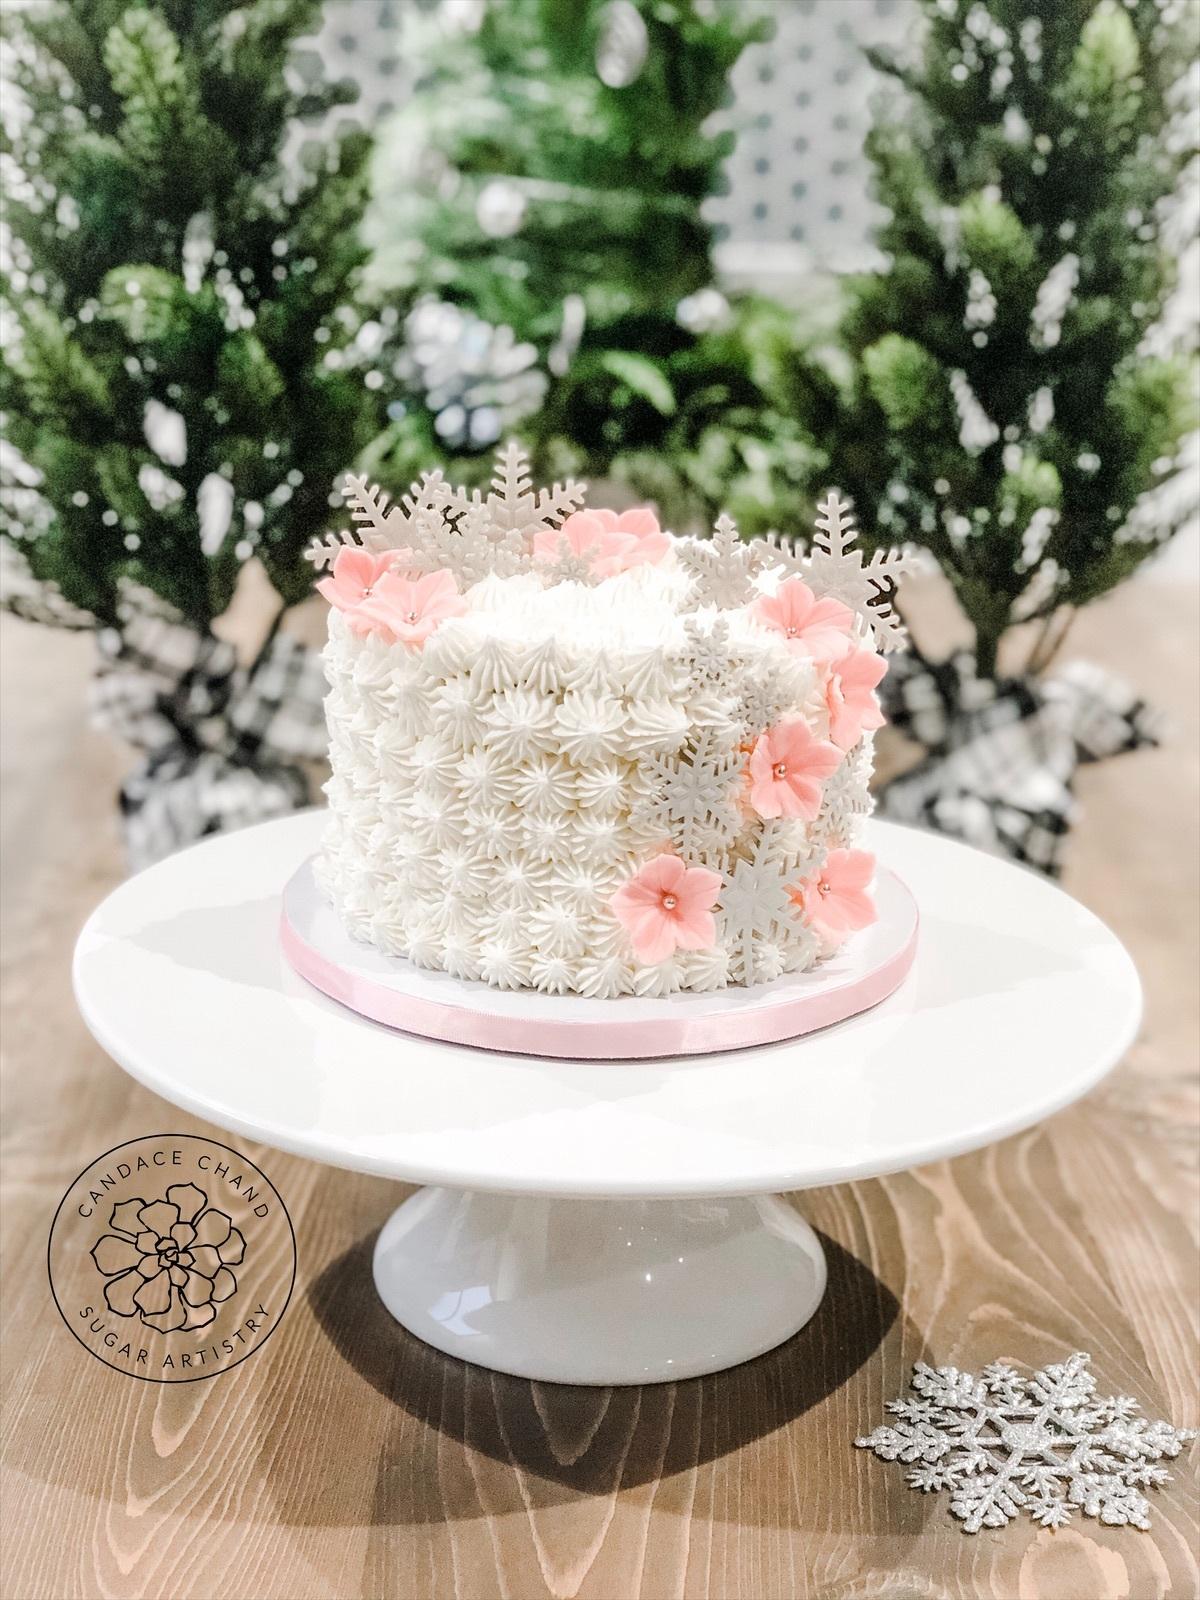 Winter snowflake buttercream cake